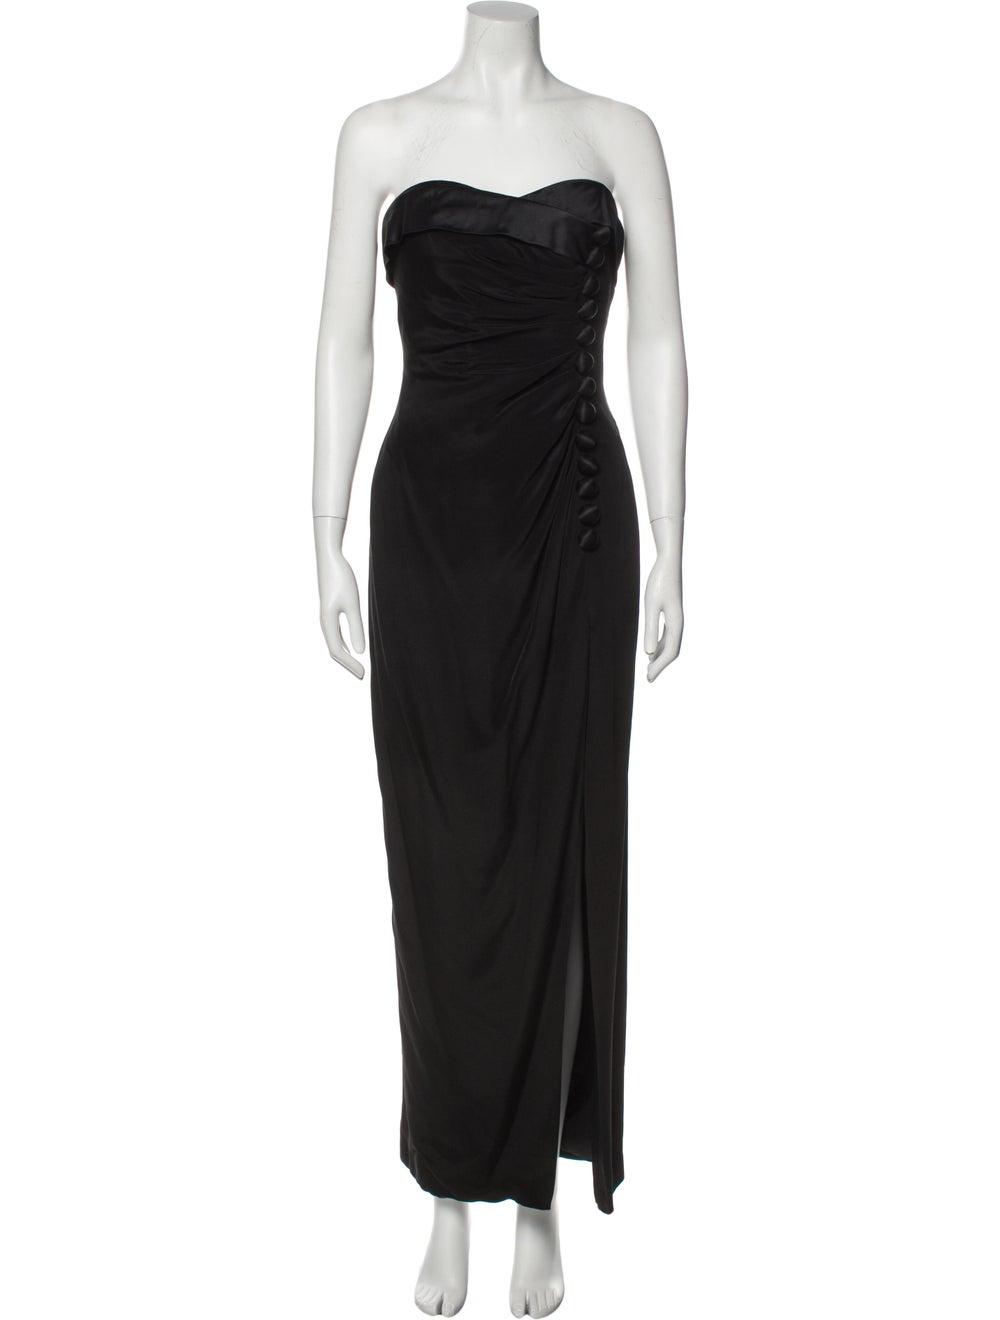 Arnold Scaasi Vintage Long Dress Black - image 1